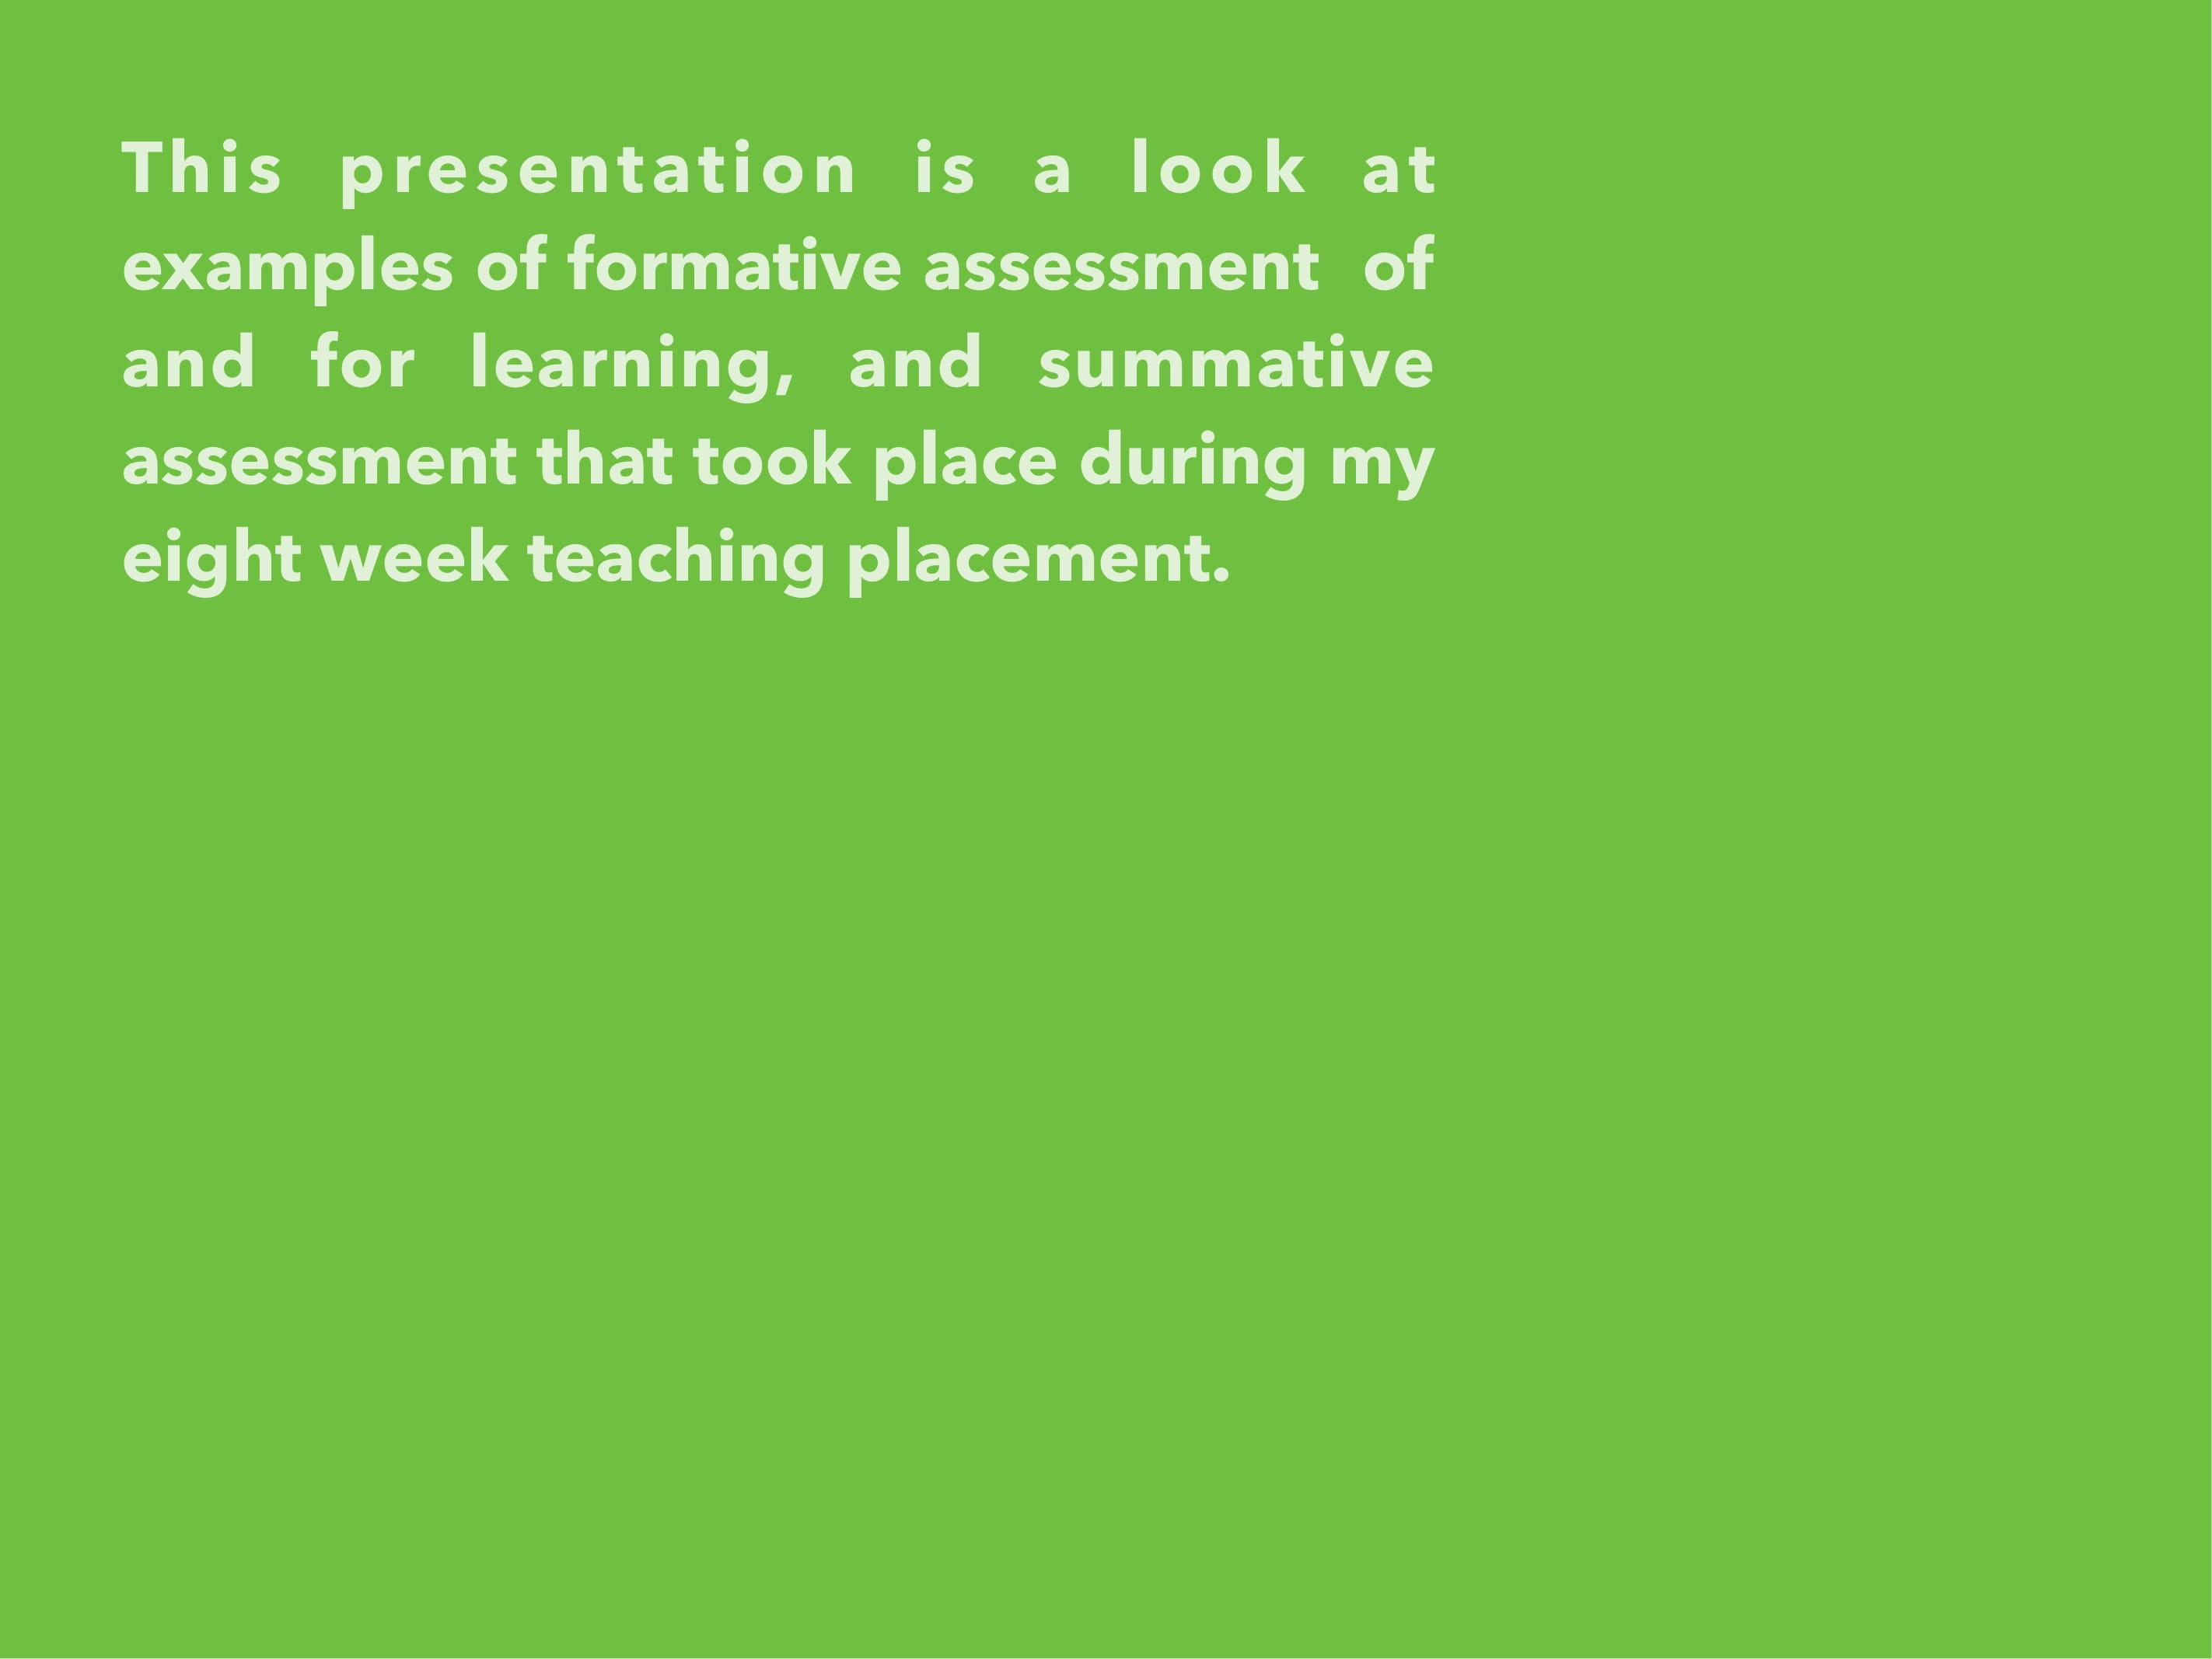 Niamh O'Toole Assessment 2017-02